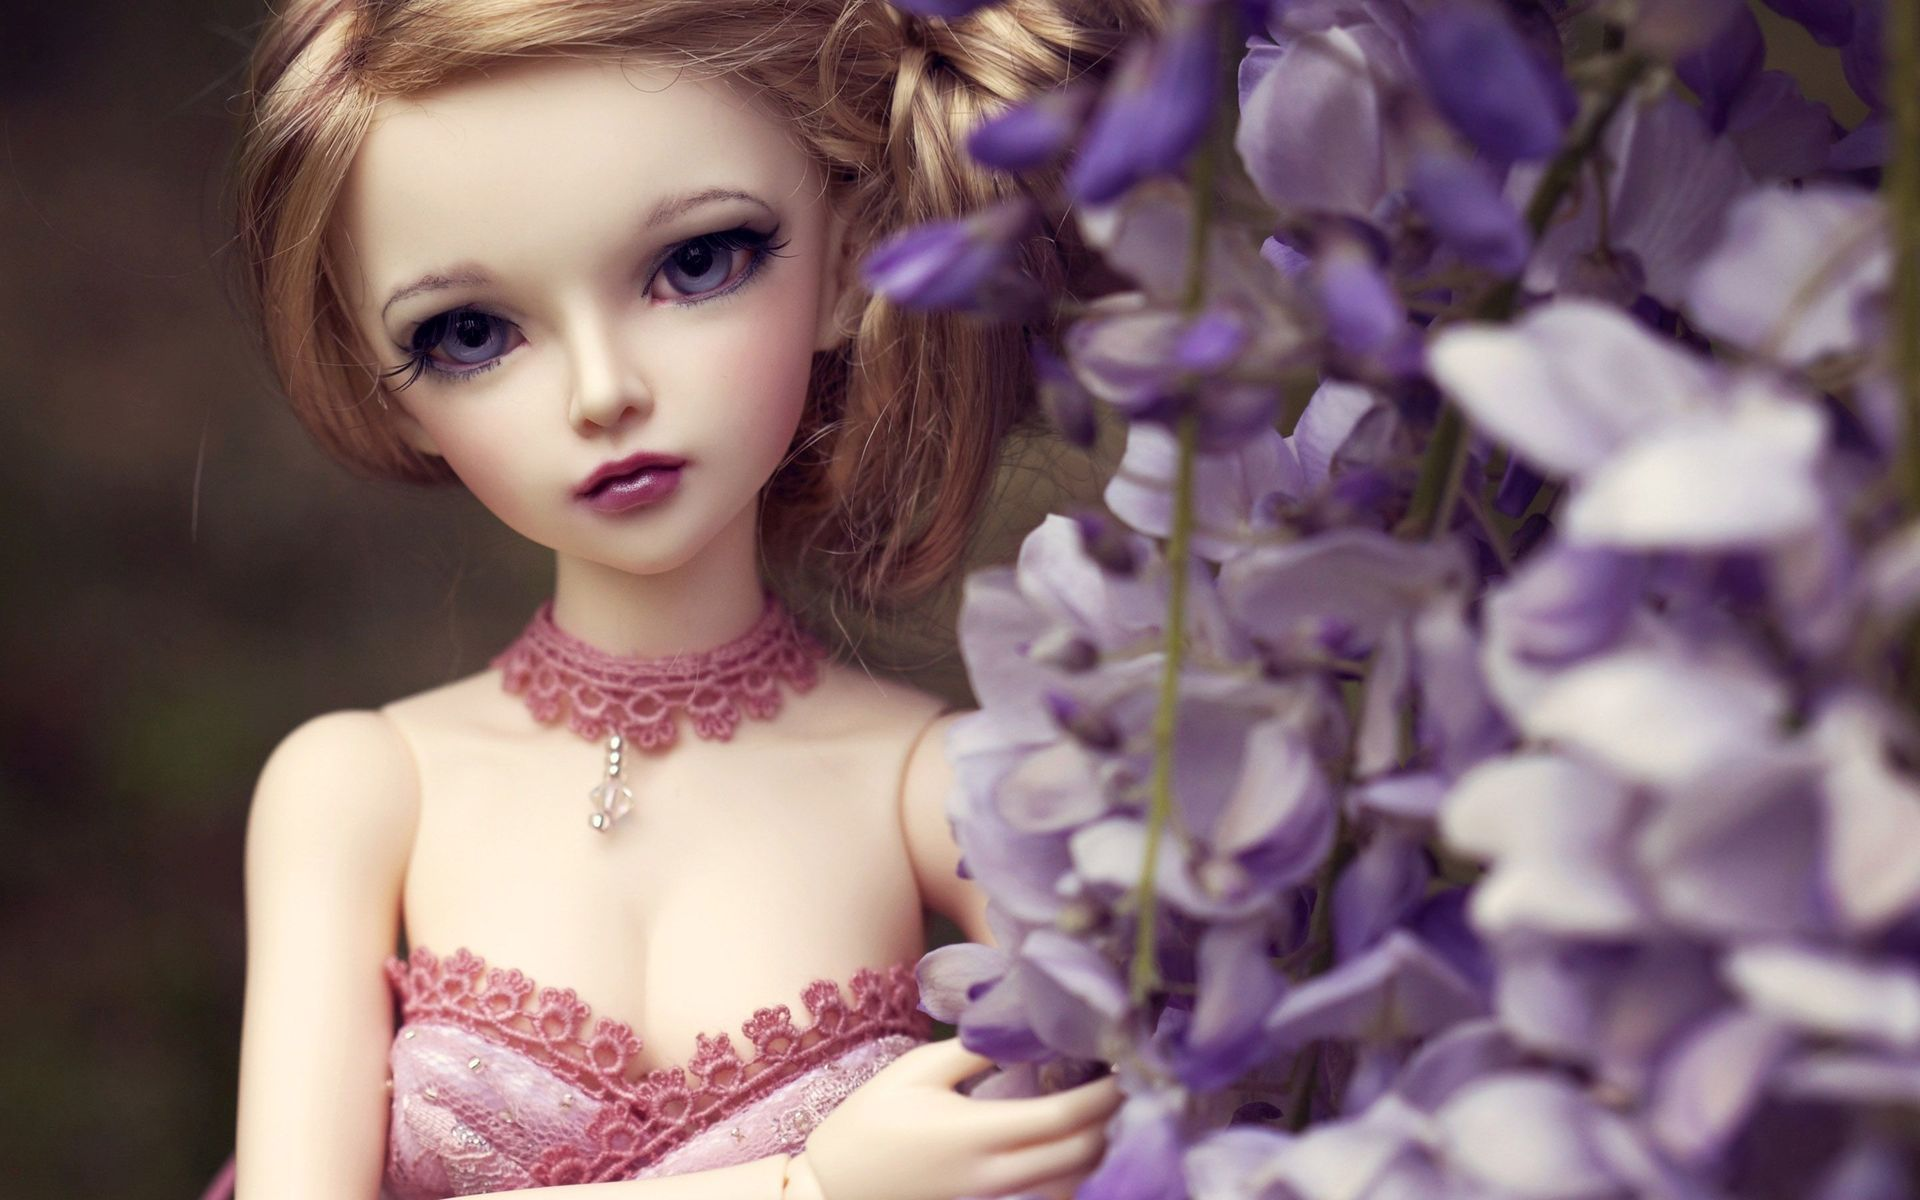 Blonde Doll Wallpaper 48641